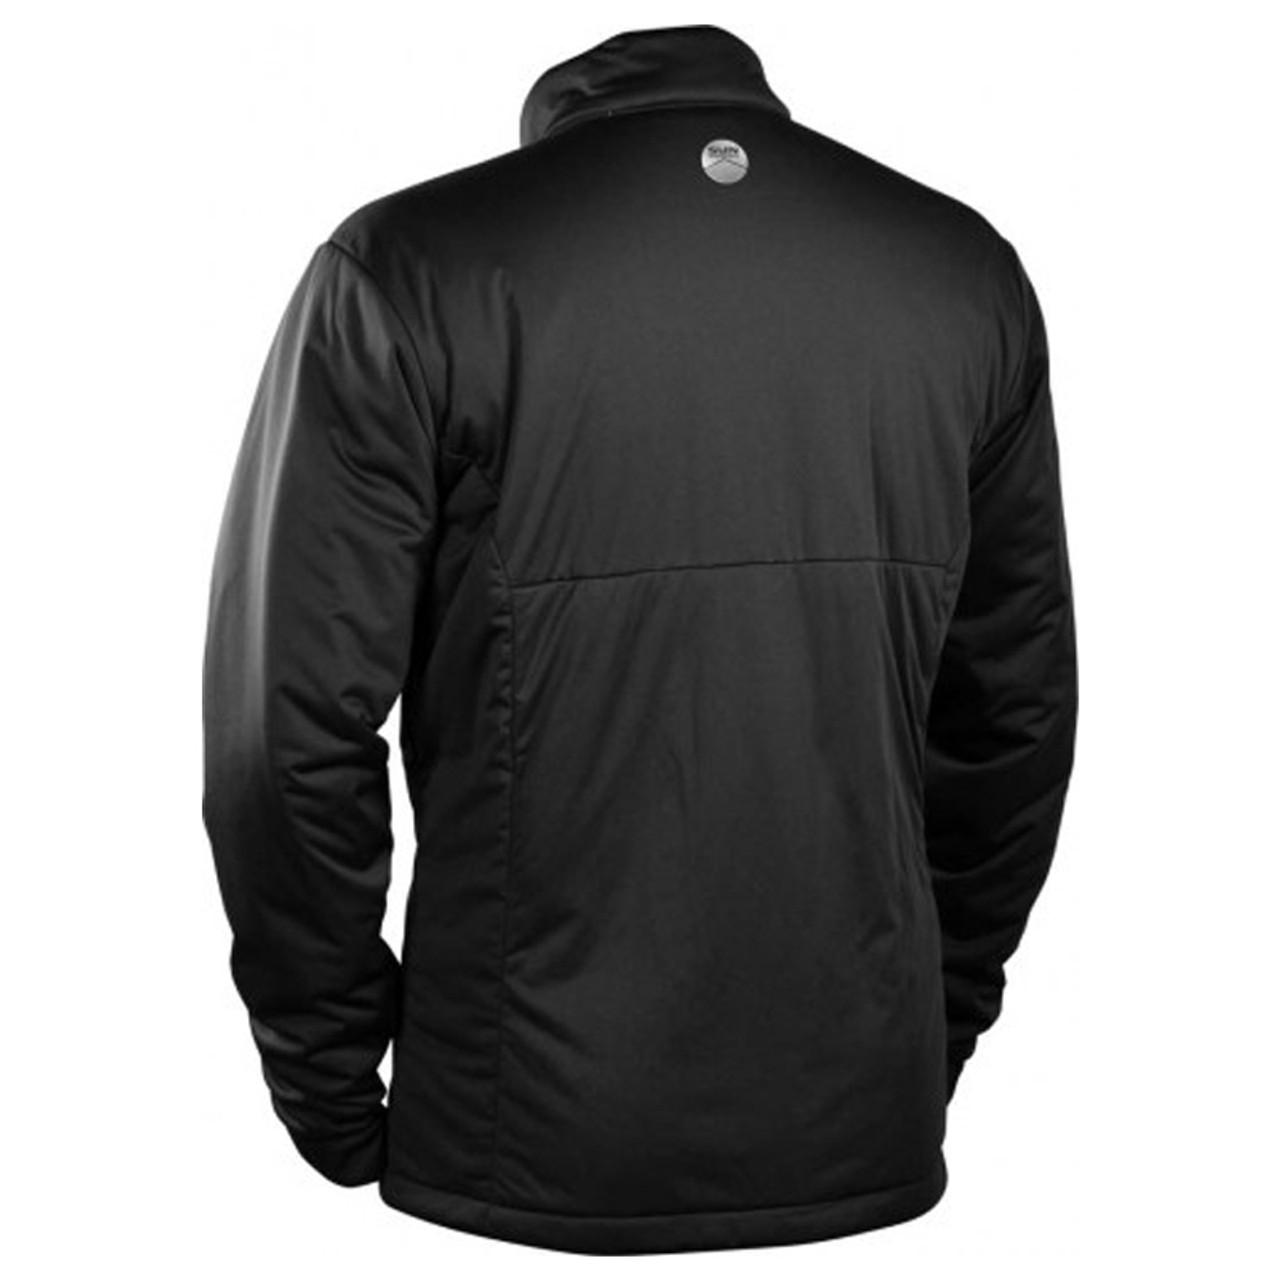 Sun Mountain Trapper Jacket - Black